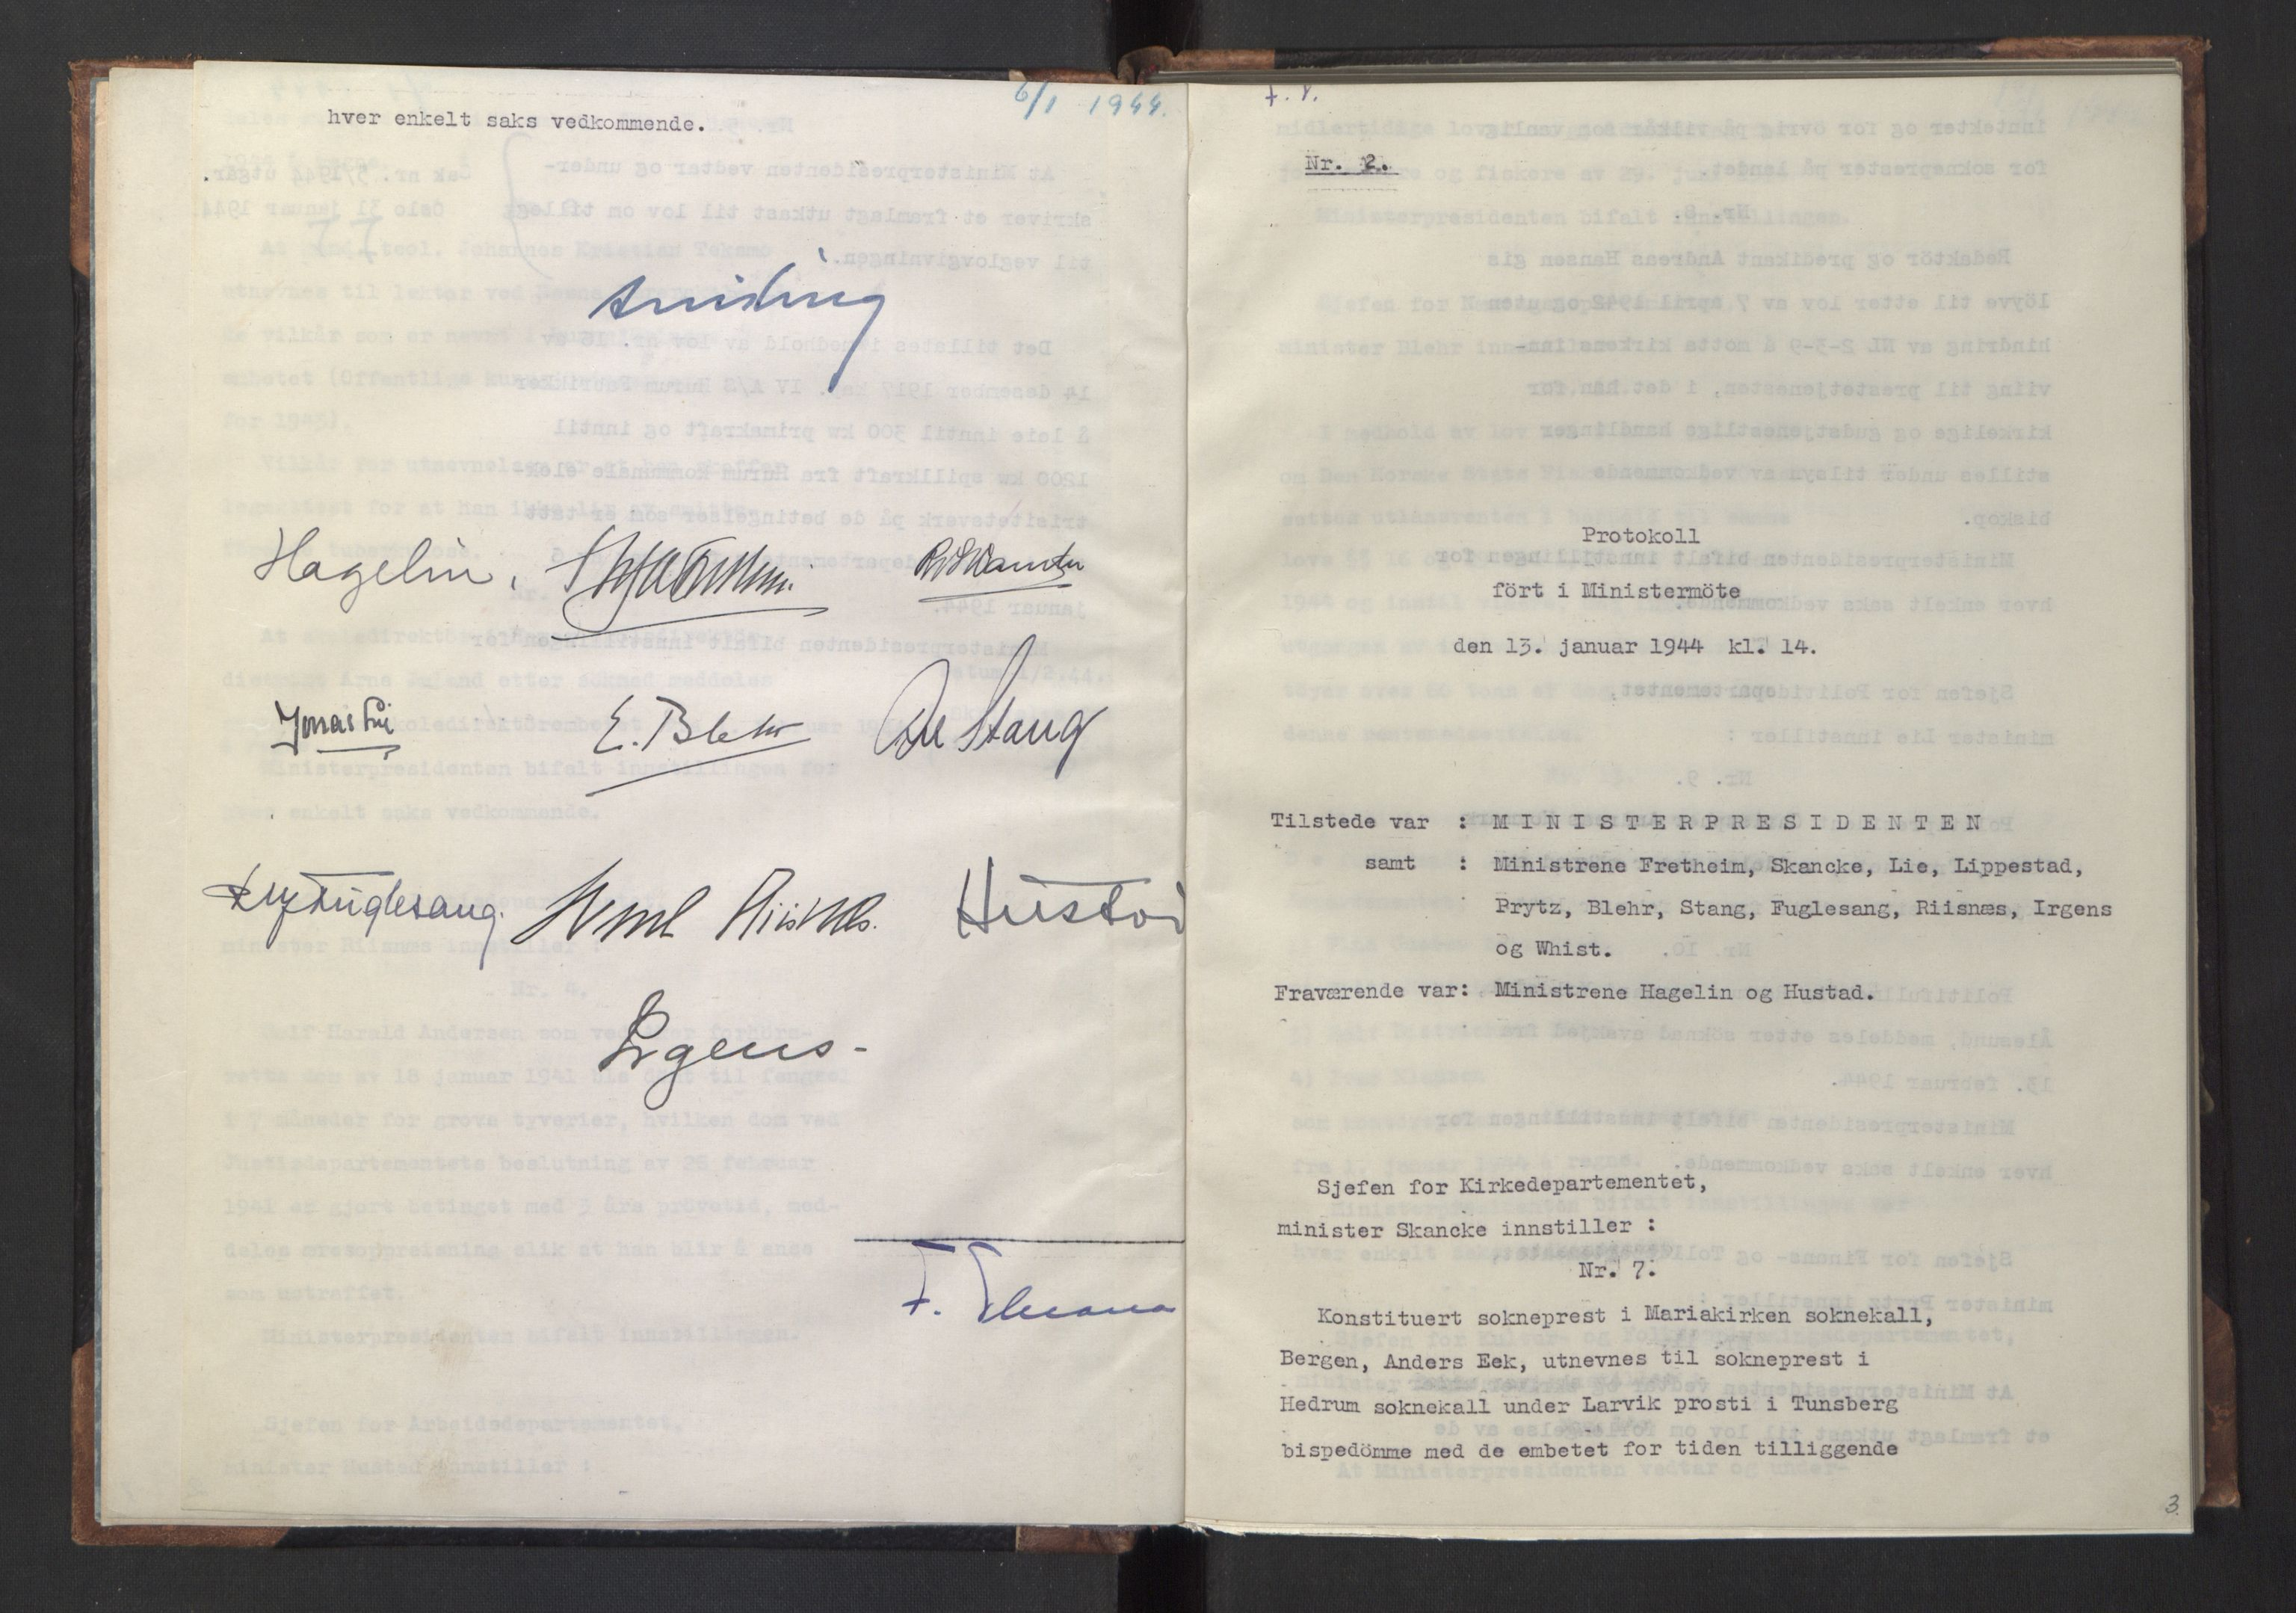 RA, NS-administrasjonen 1940-1945 (Statsrådsekretariatet, de kommisariske statsråder mm), D/Da/L0005: Protokoll fra ministermøter, 1944, s. 2b-3a